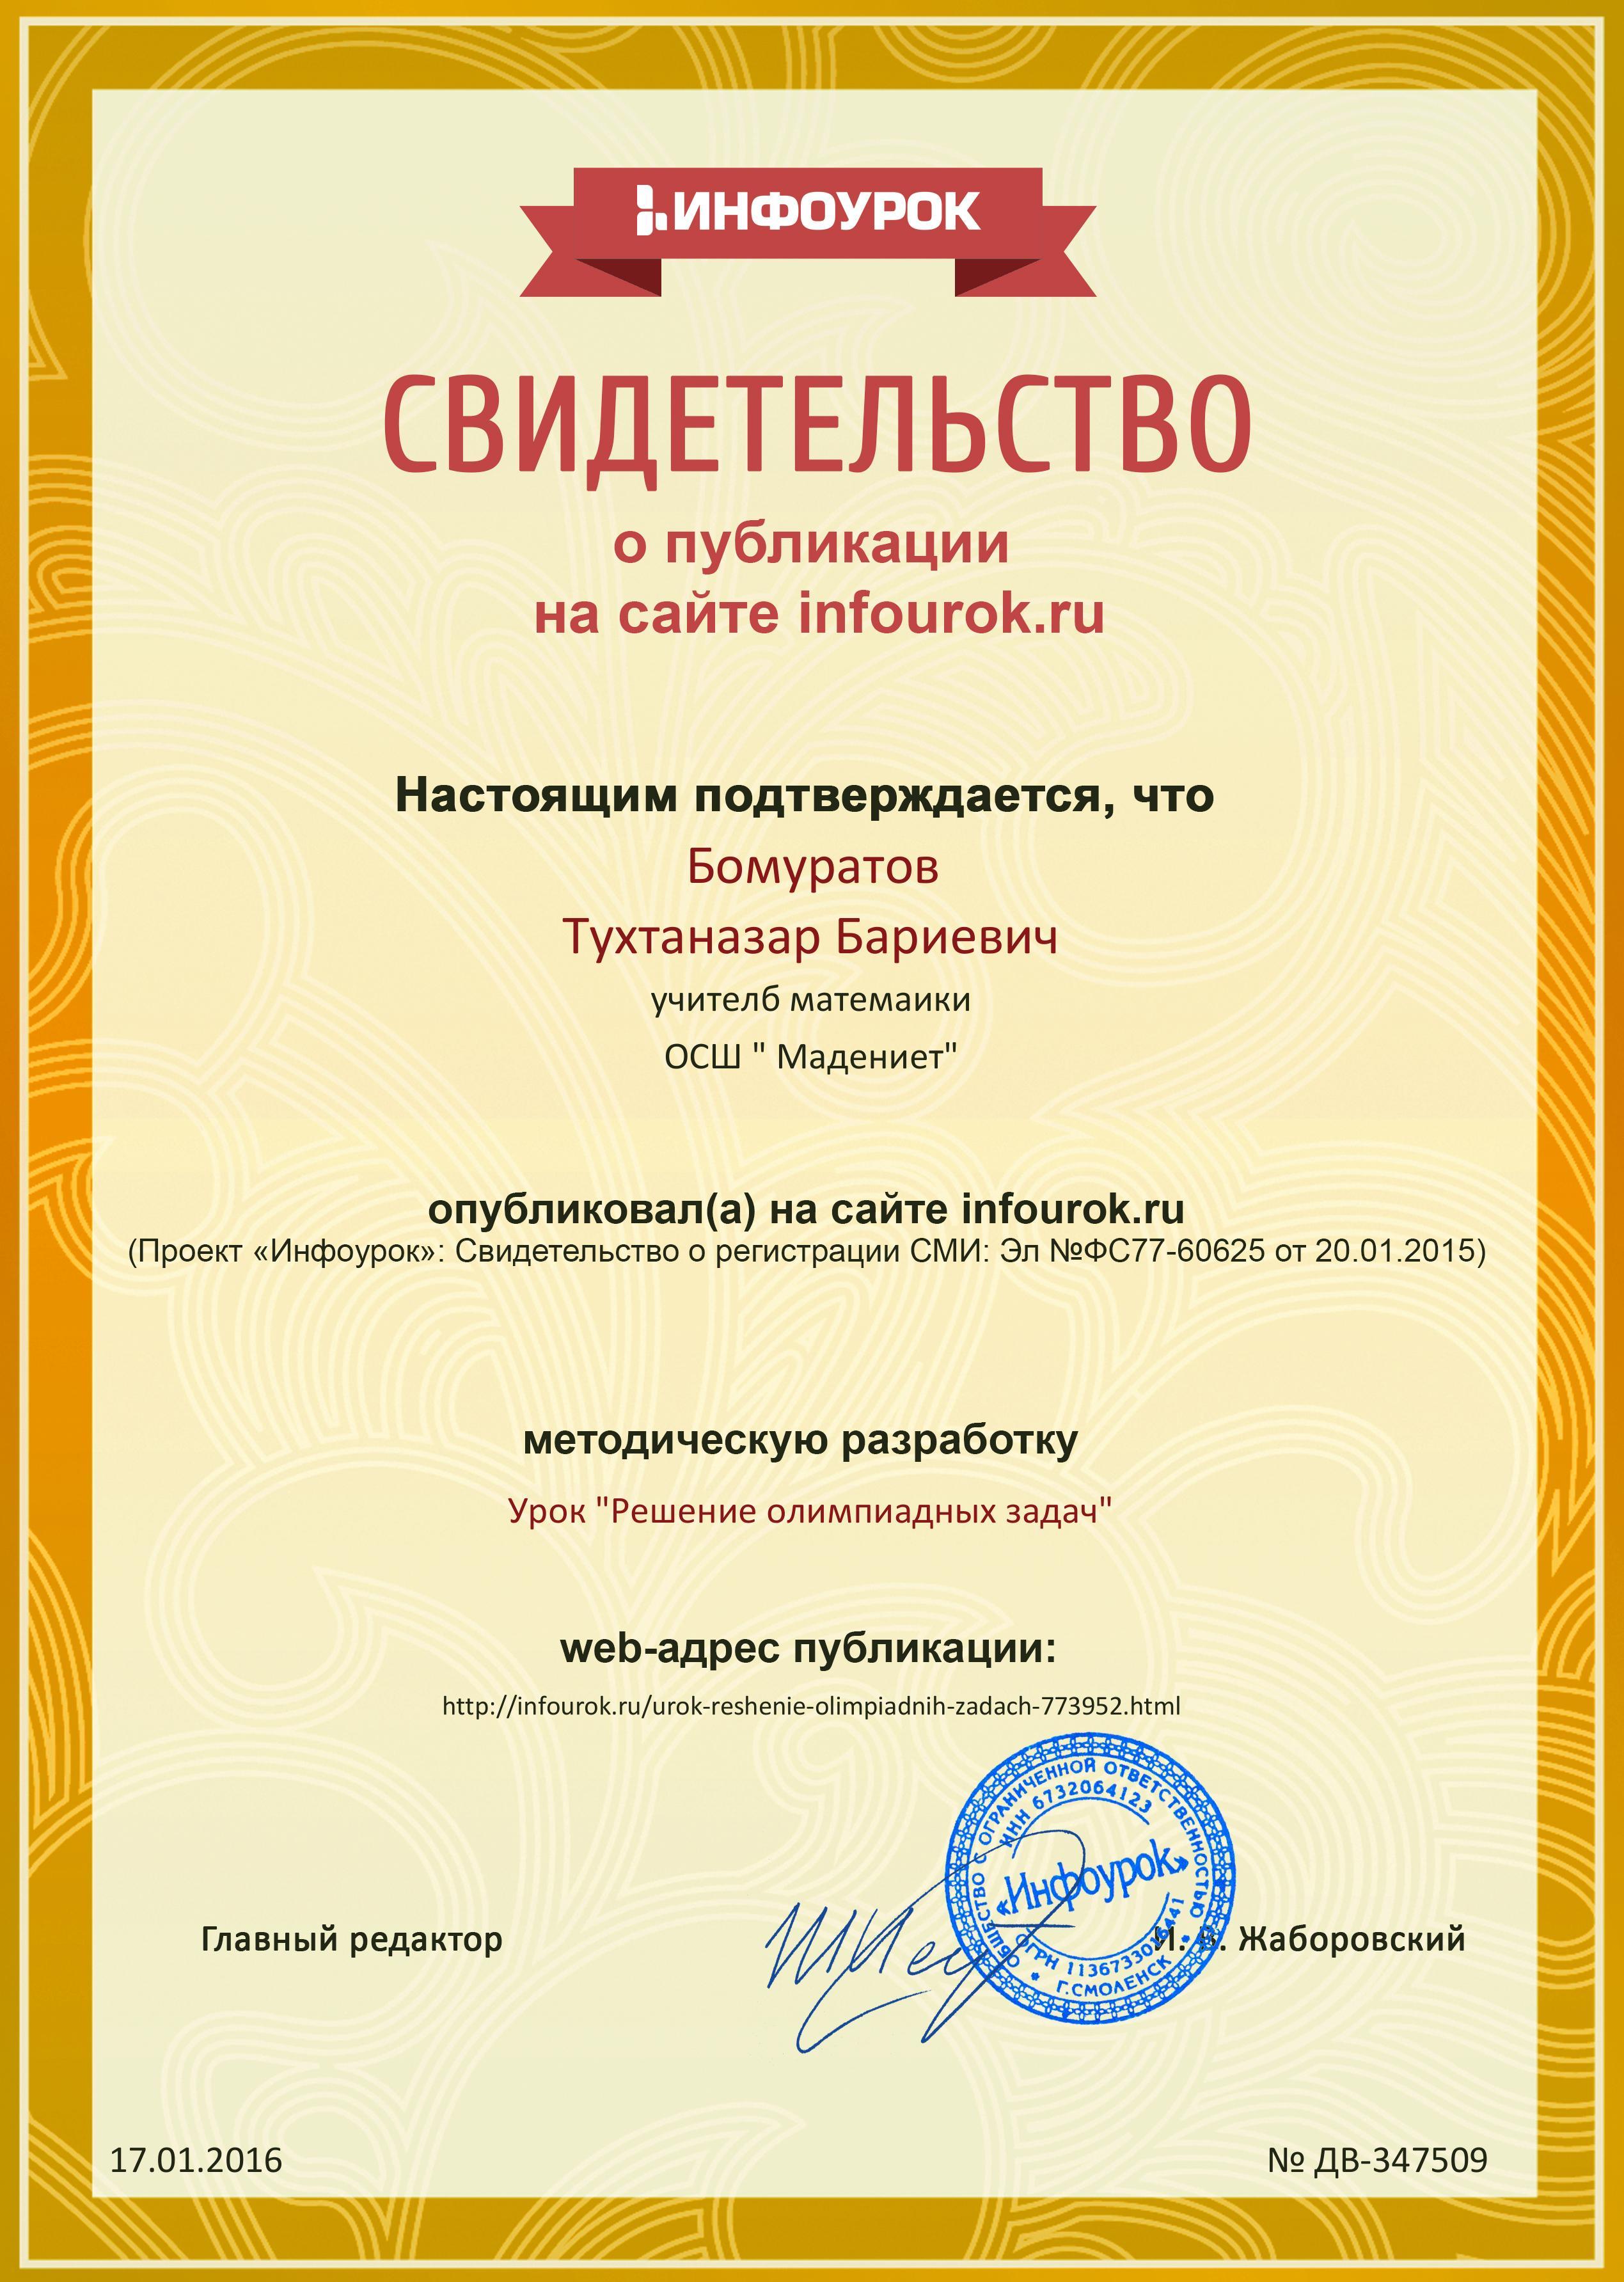 C:\Users\OTABEK\Downloads\Сертификат проекта infourok.ru № ДВ-347509.jpg